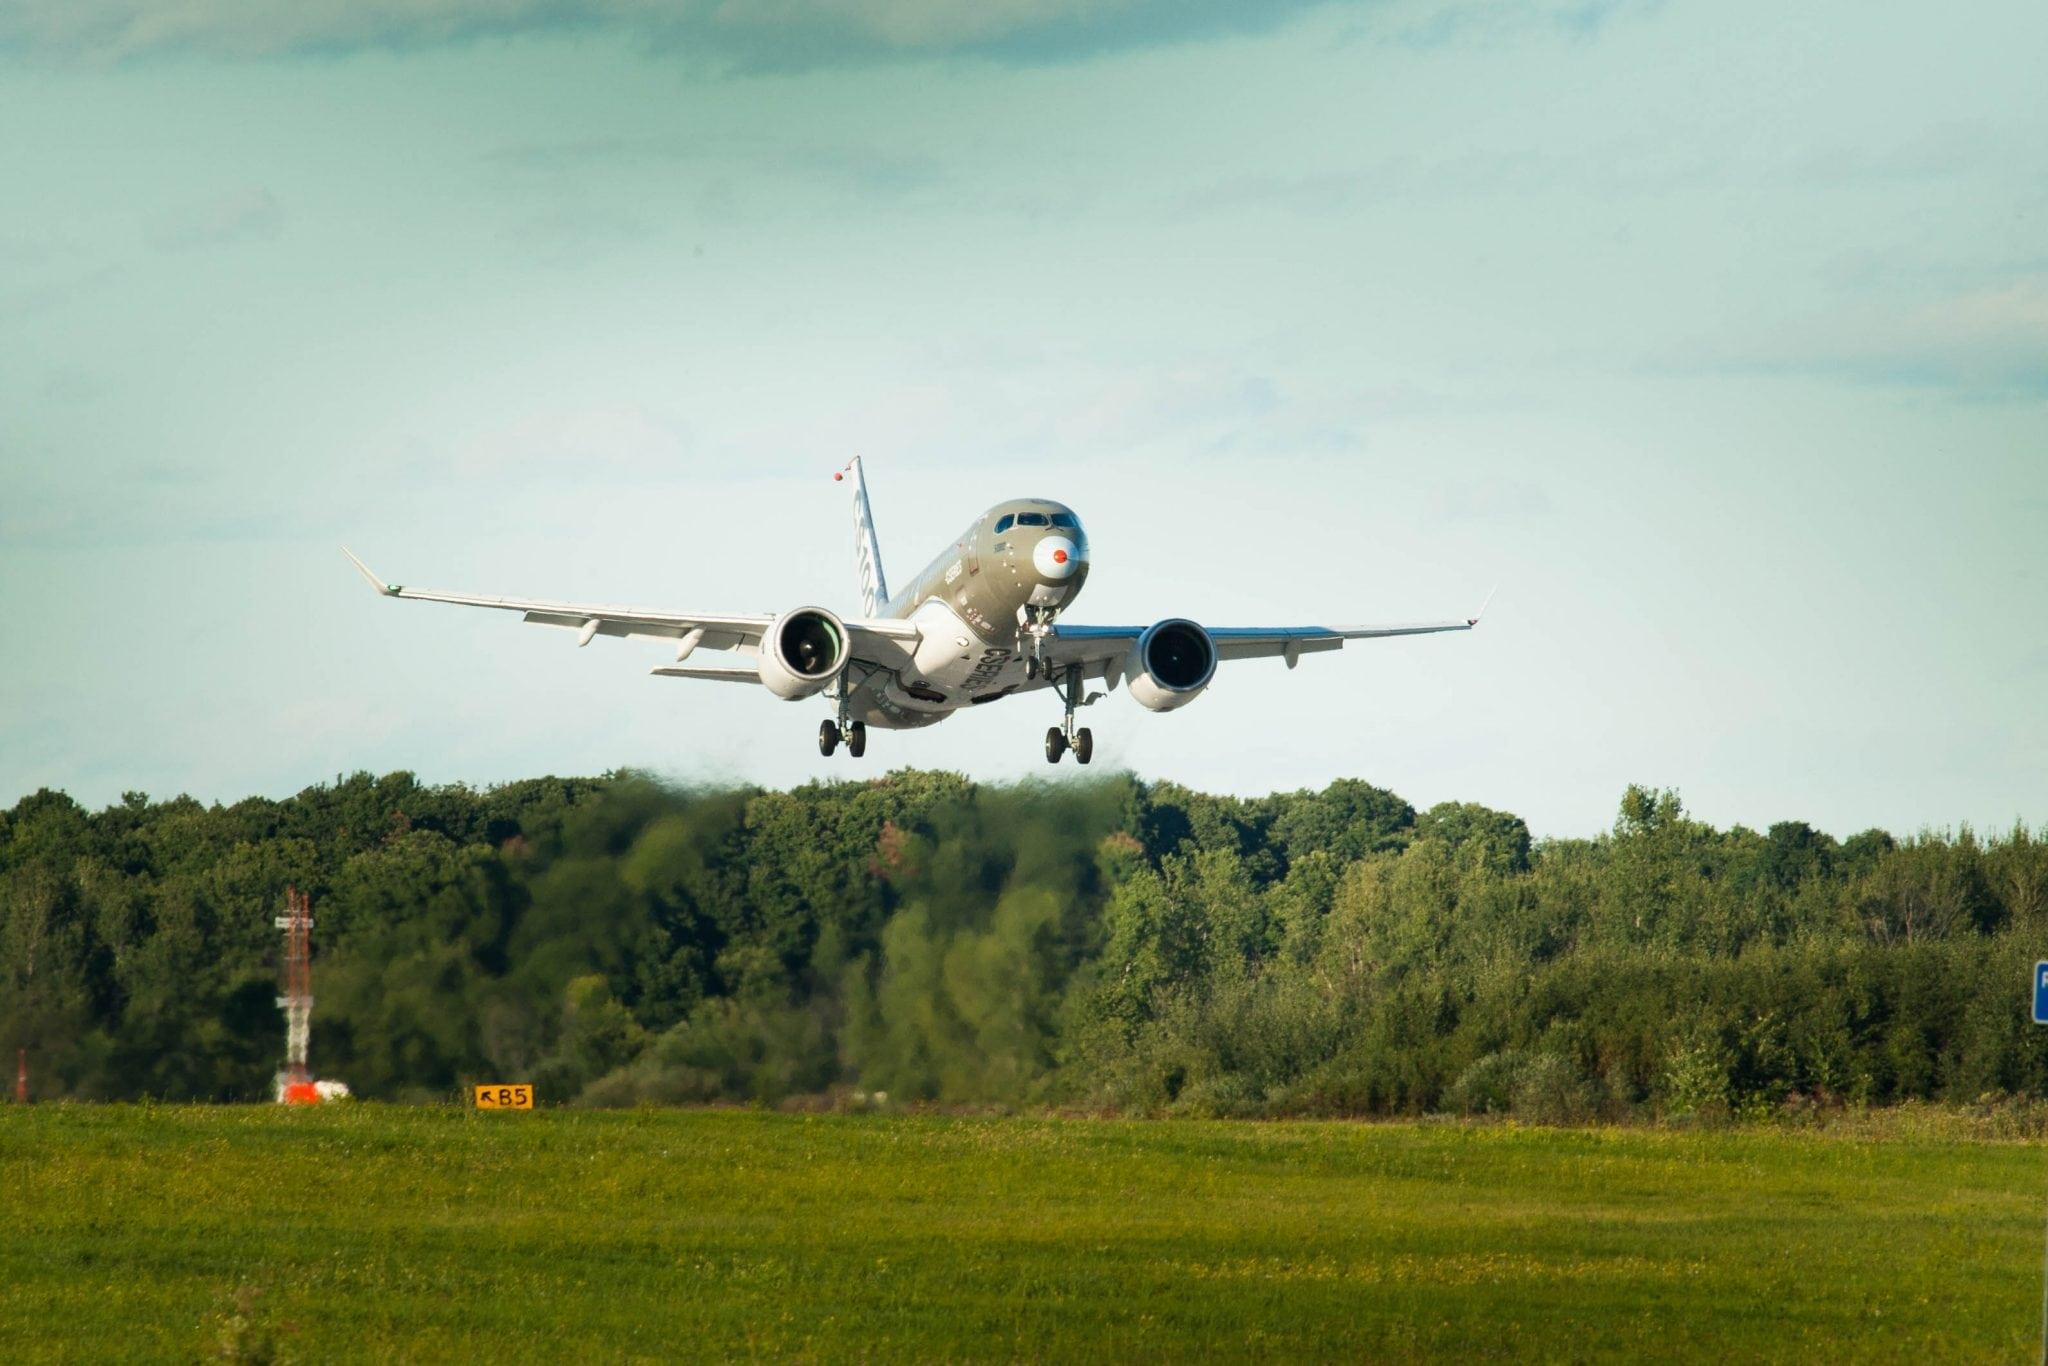 The Bombardier CSeries in flight